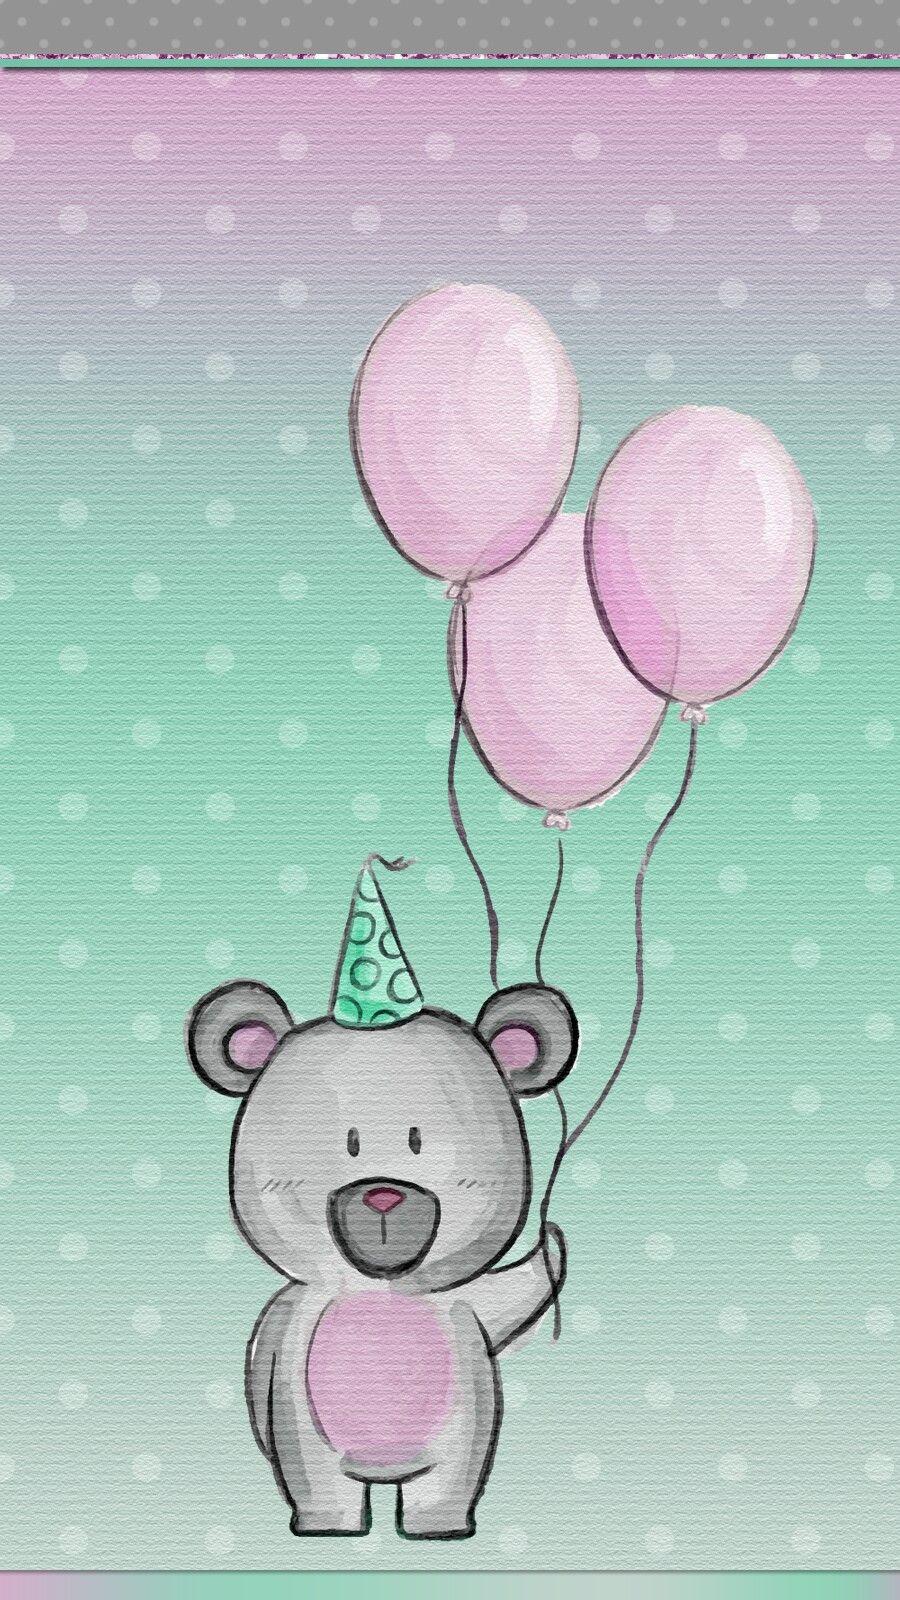 Happy Birthday To Me Birthday Wallpaper Iphone Wallpaper Teddy Bear Wallpaper